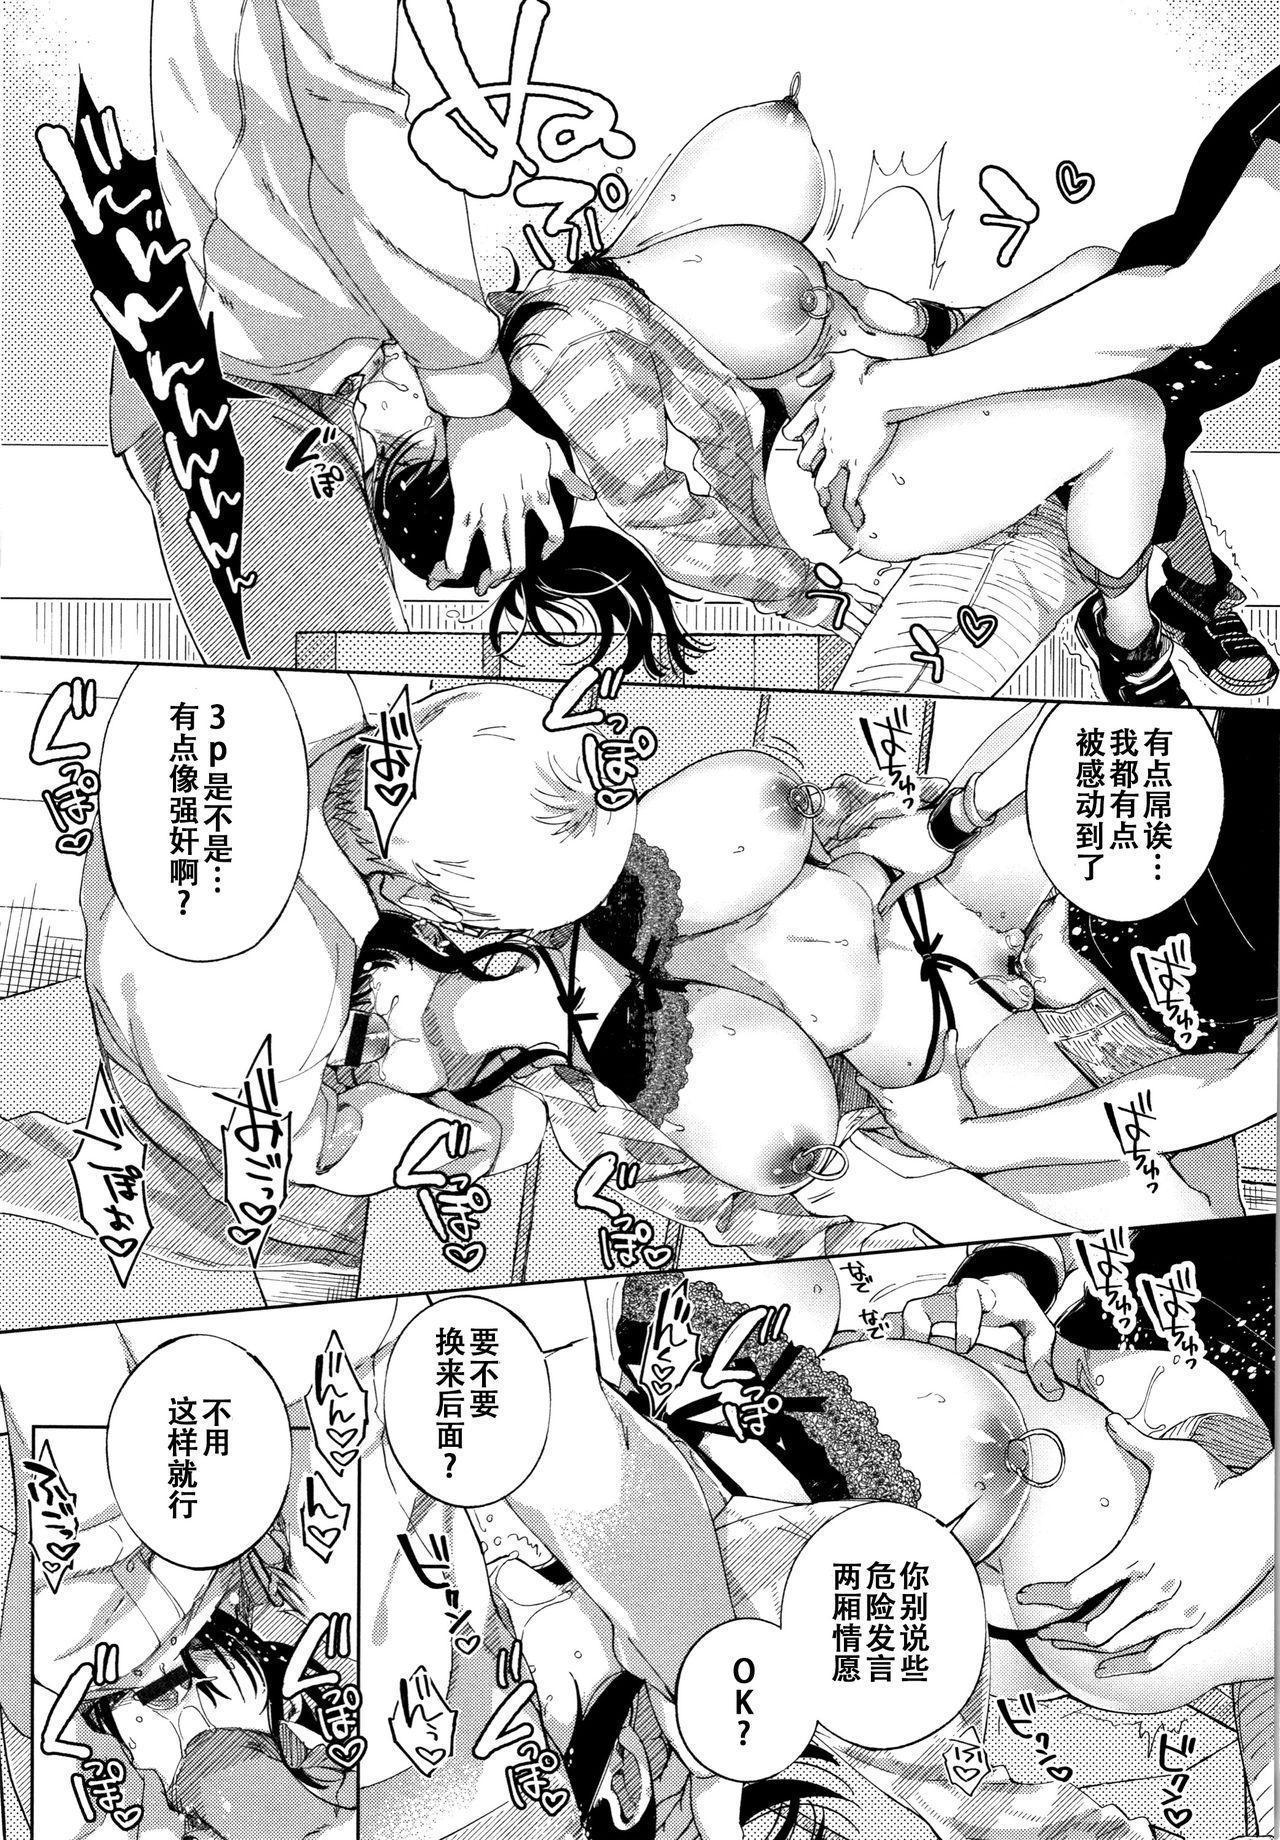 [Achumuchi] Saijaku Gal wa Ikizurai! - The weakest pussy is hard to go.ch.1-8 [Chinese] [战栗的玻璃棒汉化] [Ongoing] 35